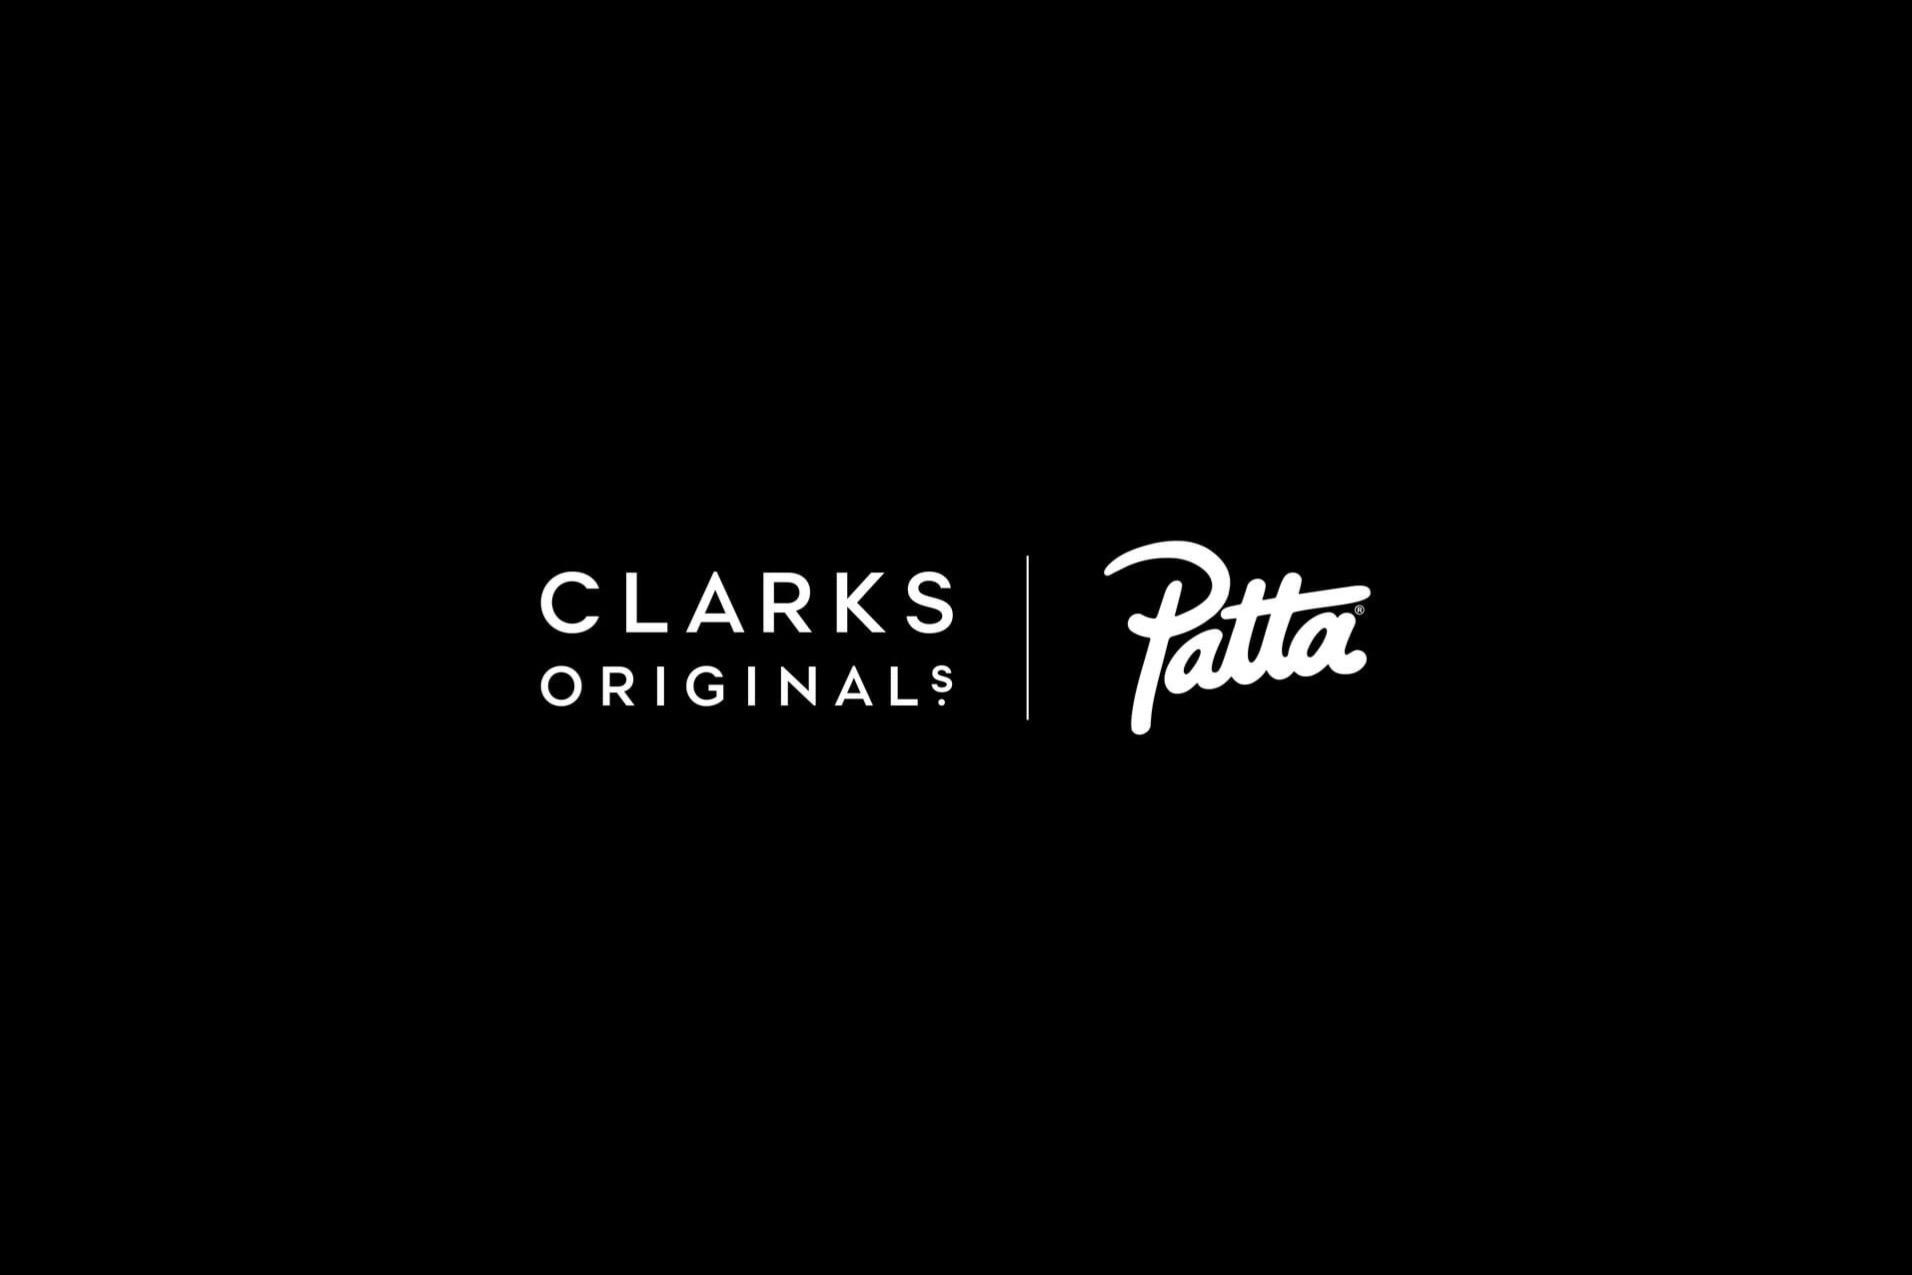 Patta x Clarks Originals 联名系列即将来袭